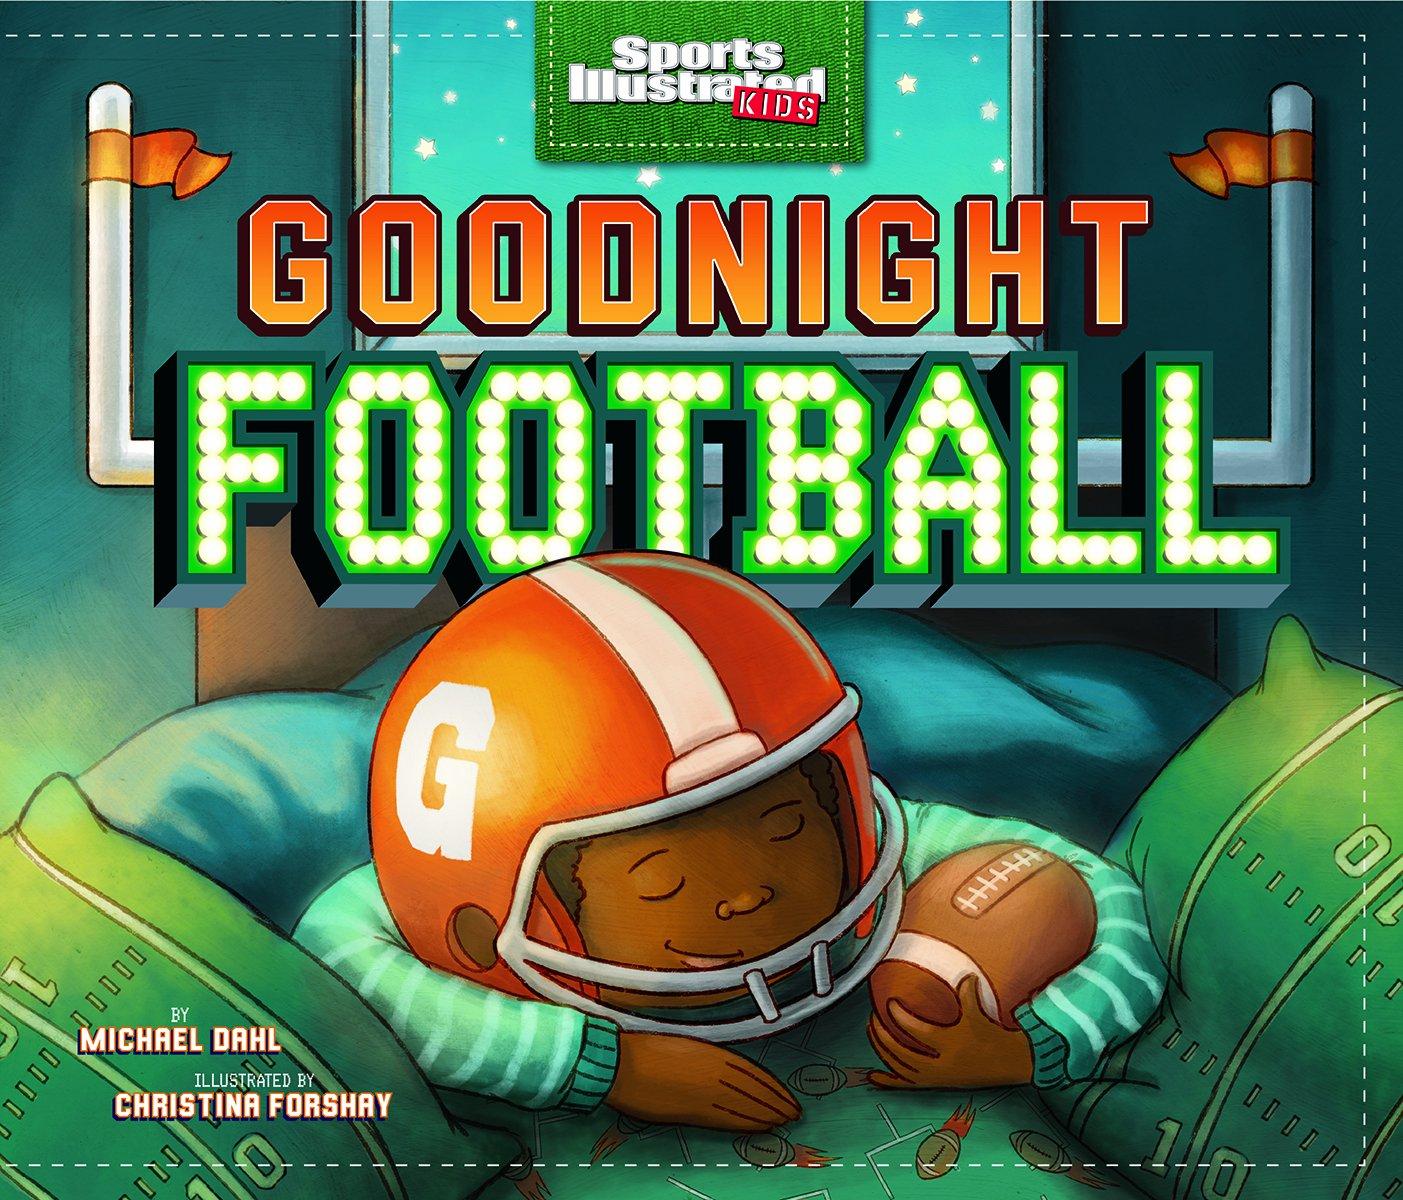 https://www.goodreads.com/book/show/20538995-goodnight-football?ac=1